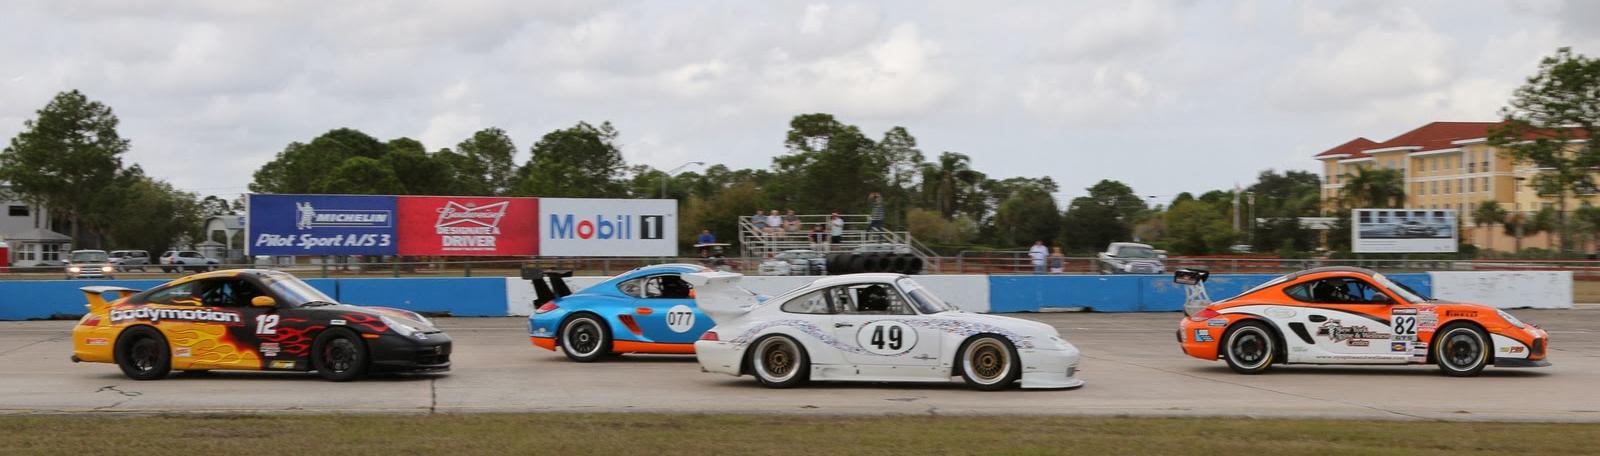 Club Racing Porsche Club Of America - Porsche club racing